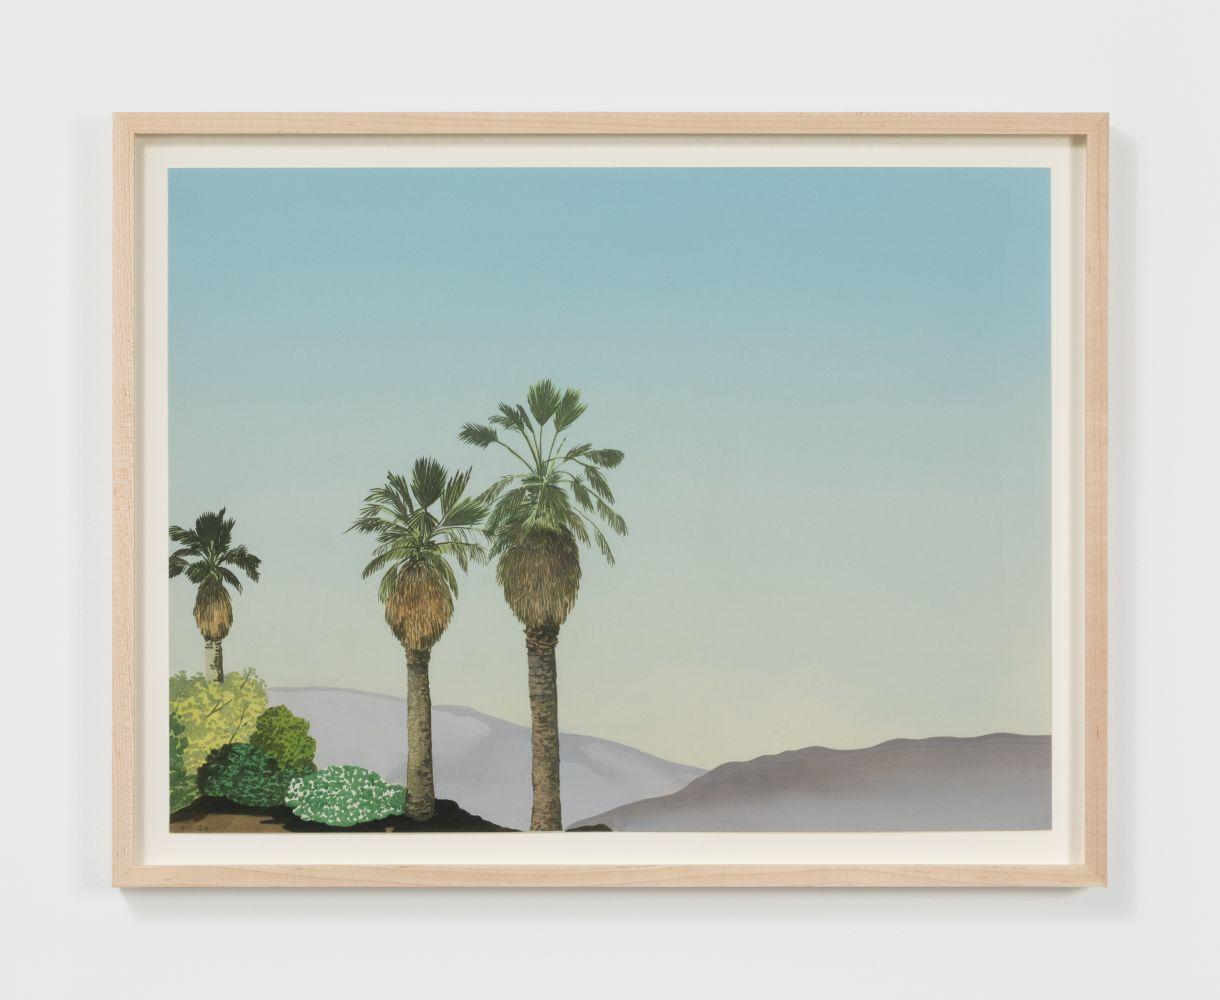 Jake Longstreth Untitled, 2020 Oil on watercolor paper 15 x 20 in 38.1 x 50.8 cm (JLO20.030)